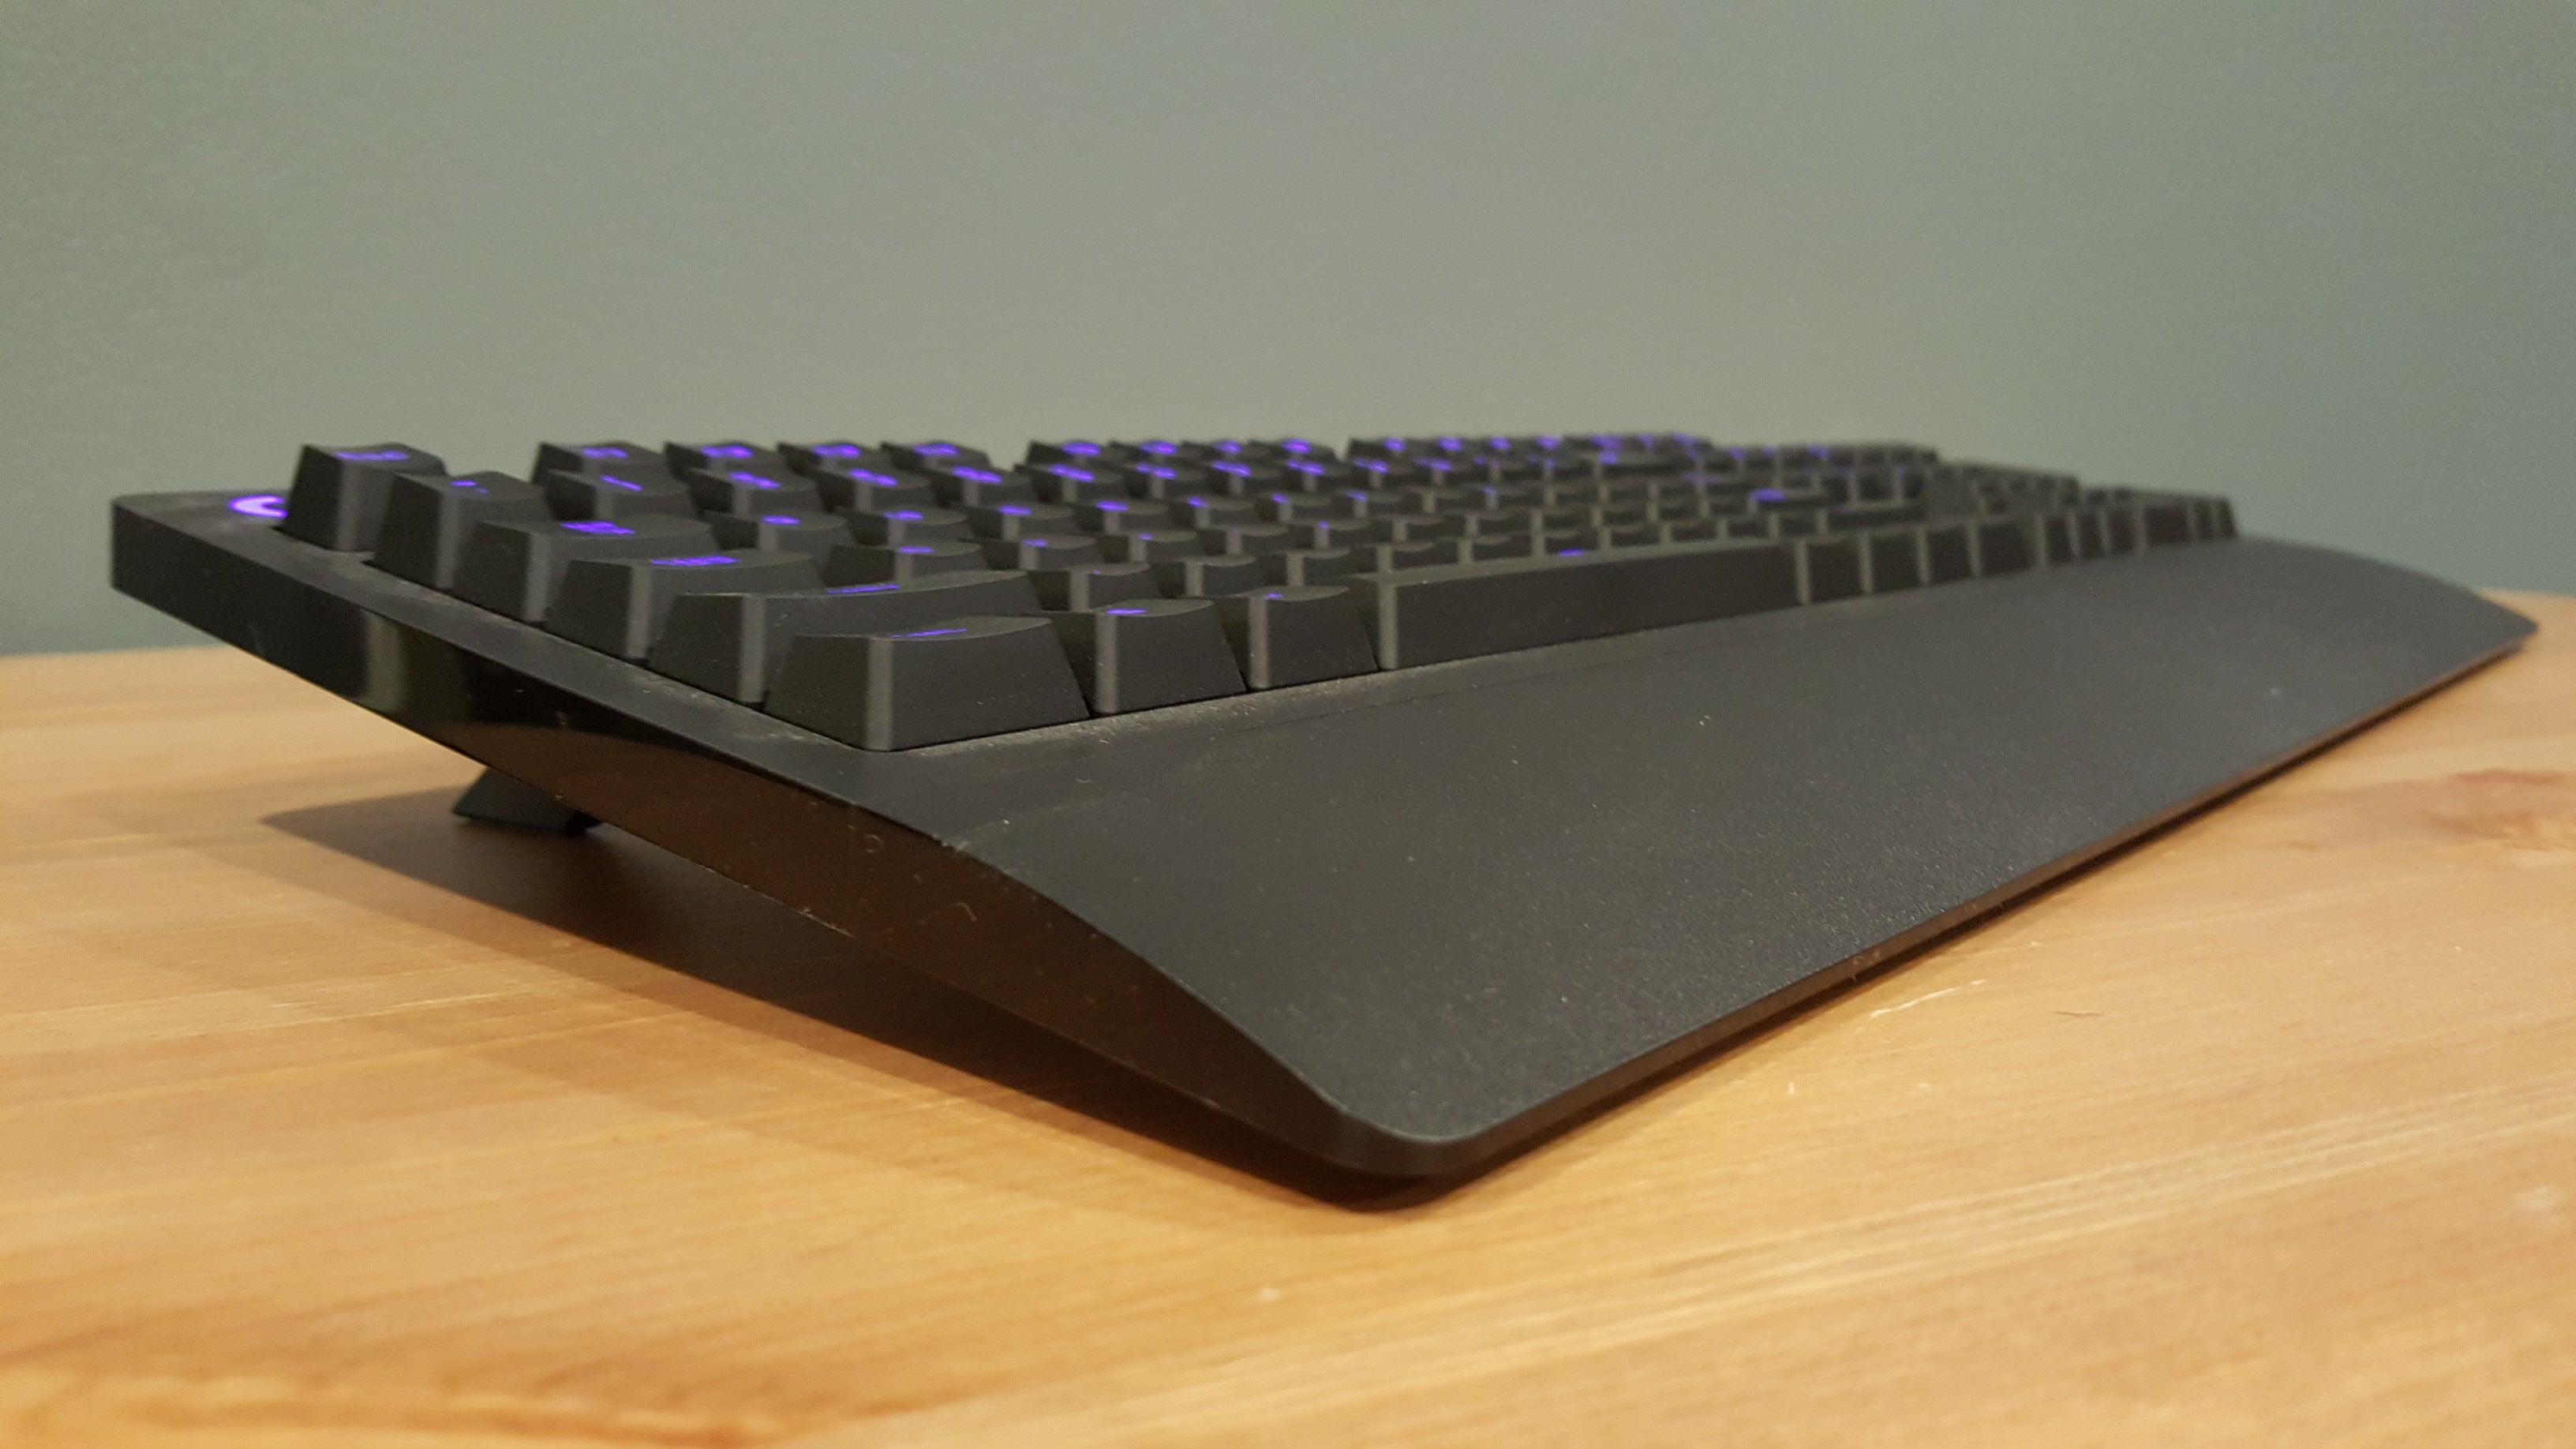 Logitech G213 Prodigy review: An ambitious keyboard that's oversized